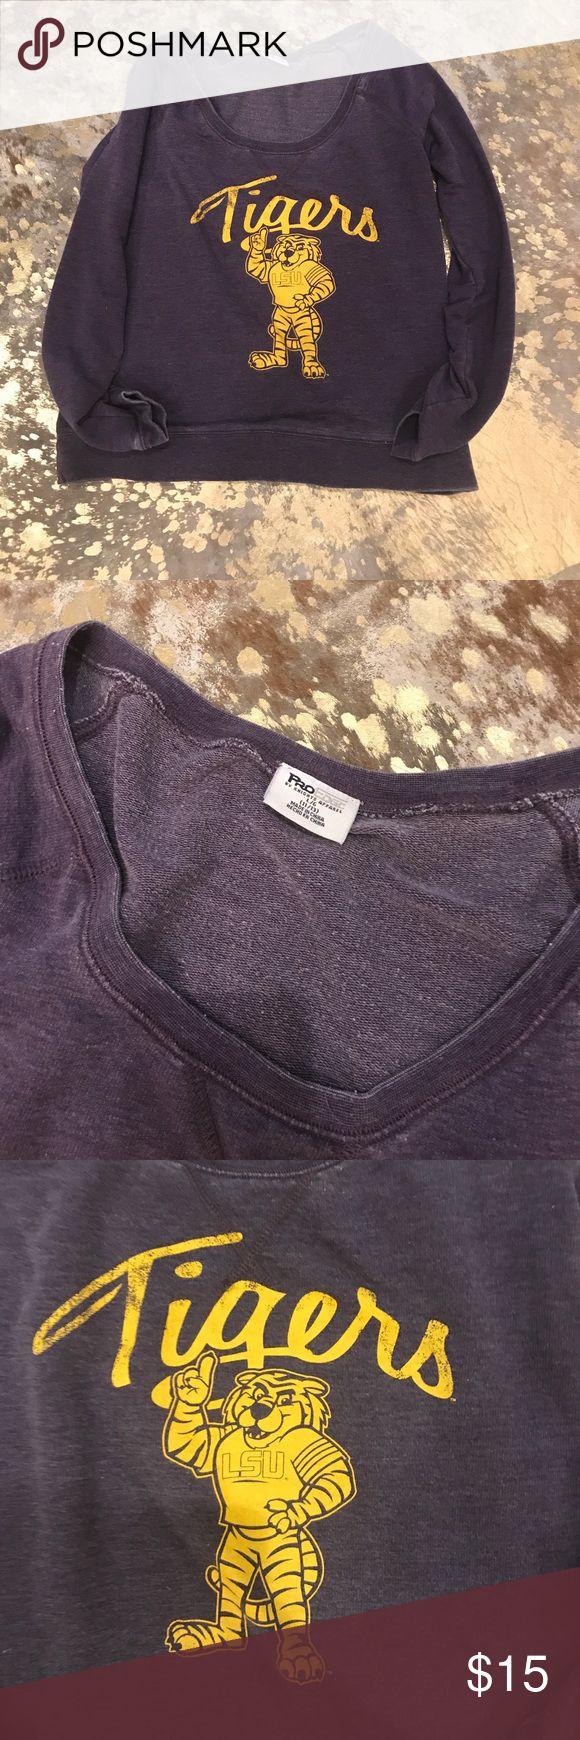 Lsu sweatshirt Great comfy team sweater Tops Sweatshirts & Hoodies